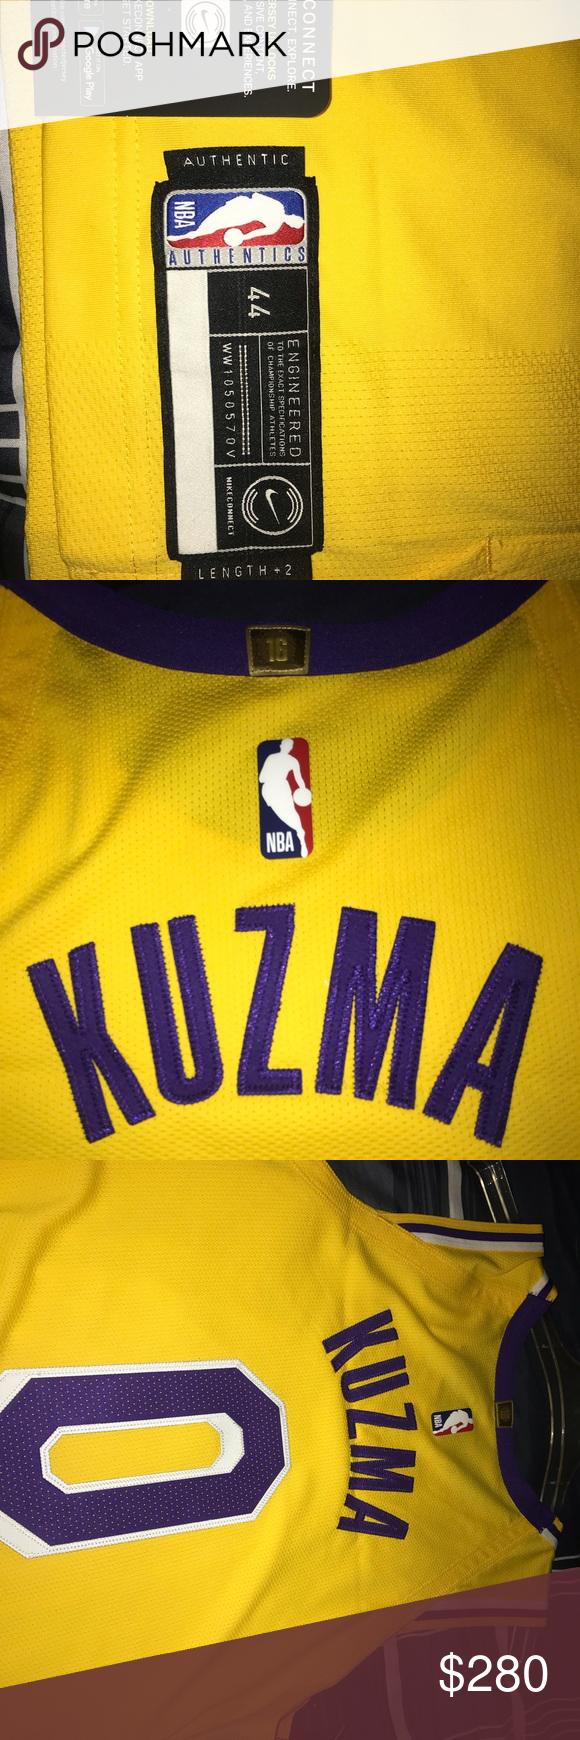 reputable site d6982 9ef8e Authentic Kyle Kuzma Lakers Jersey Authentic on court pro ...